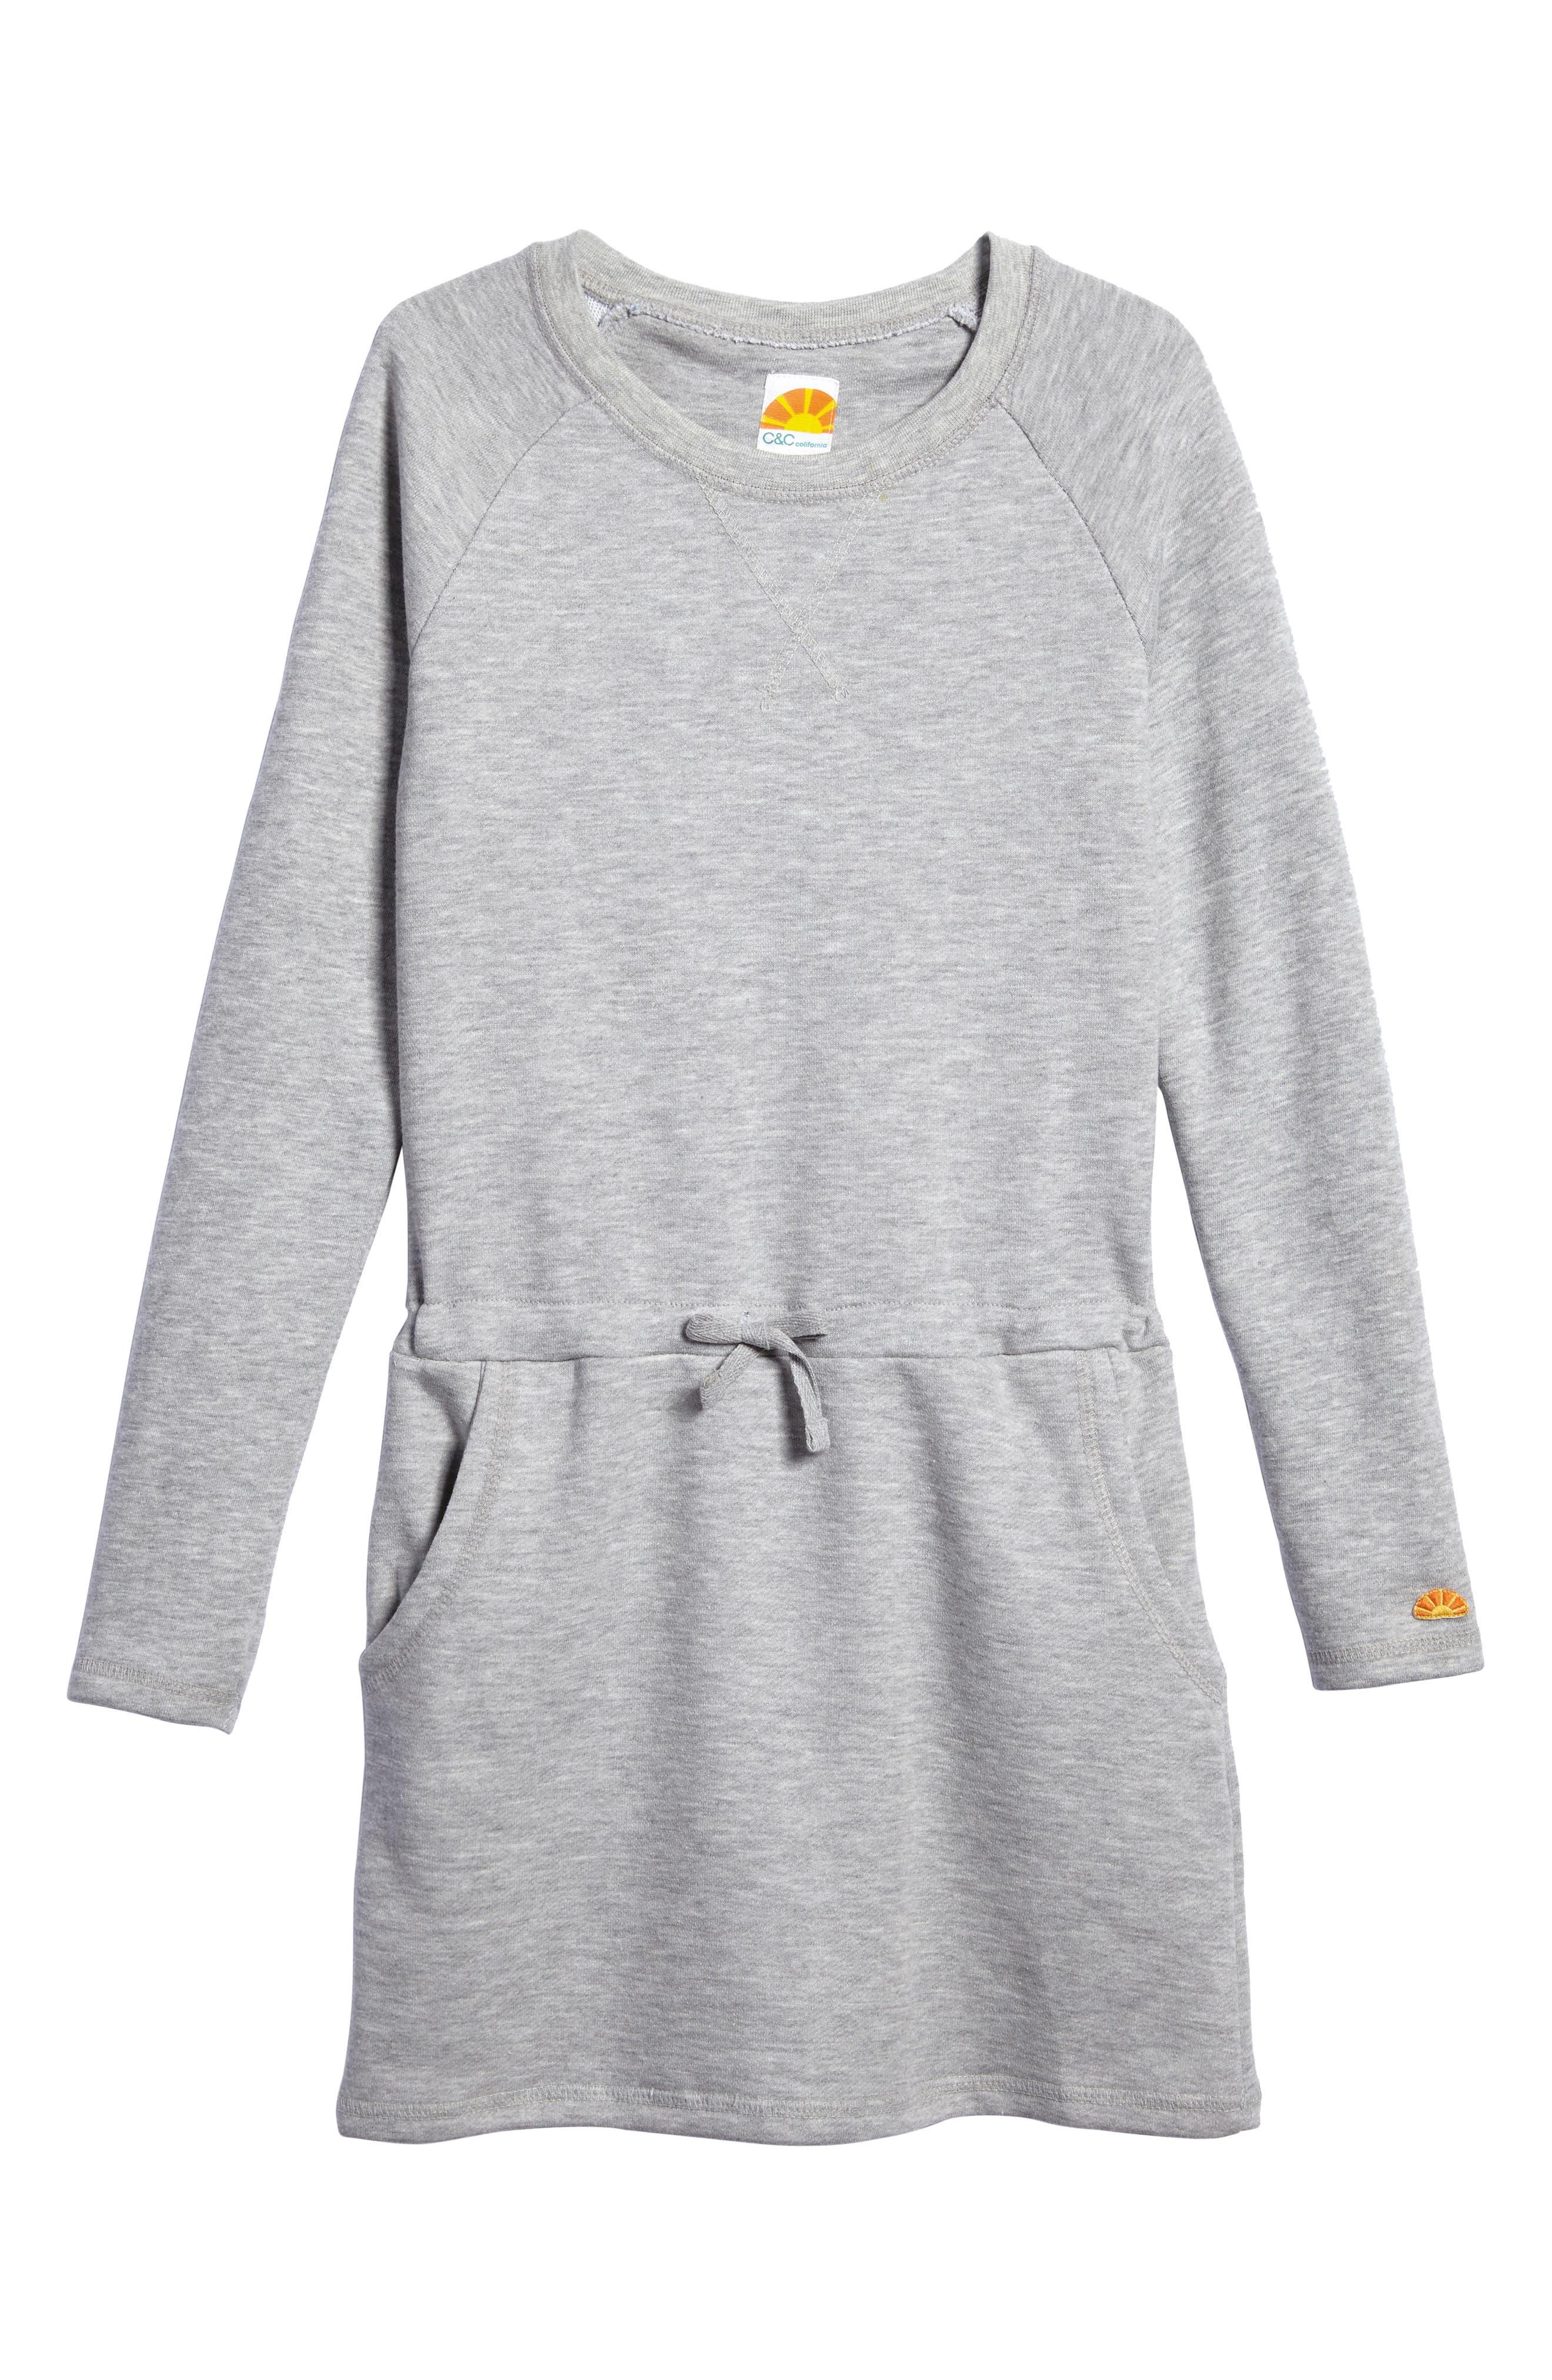 Sweatshirt Dress,                         Main,                         color, Pearl Heather